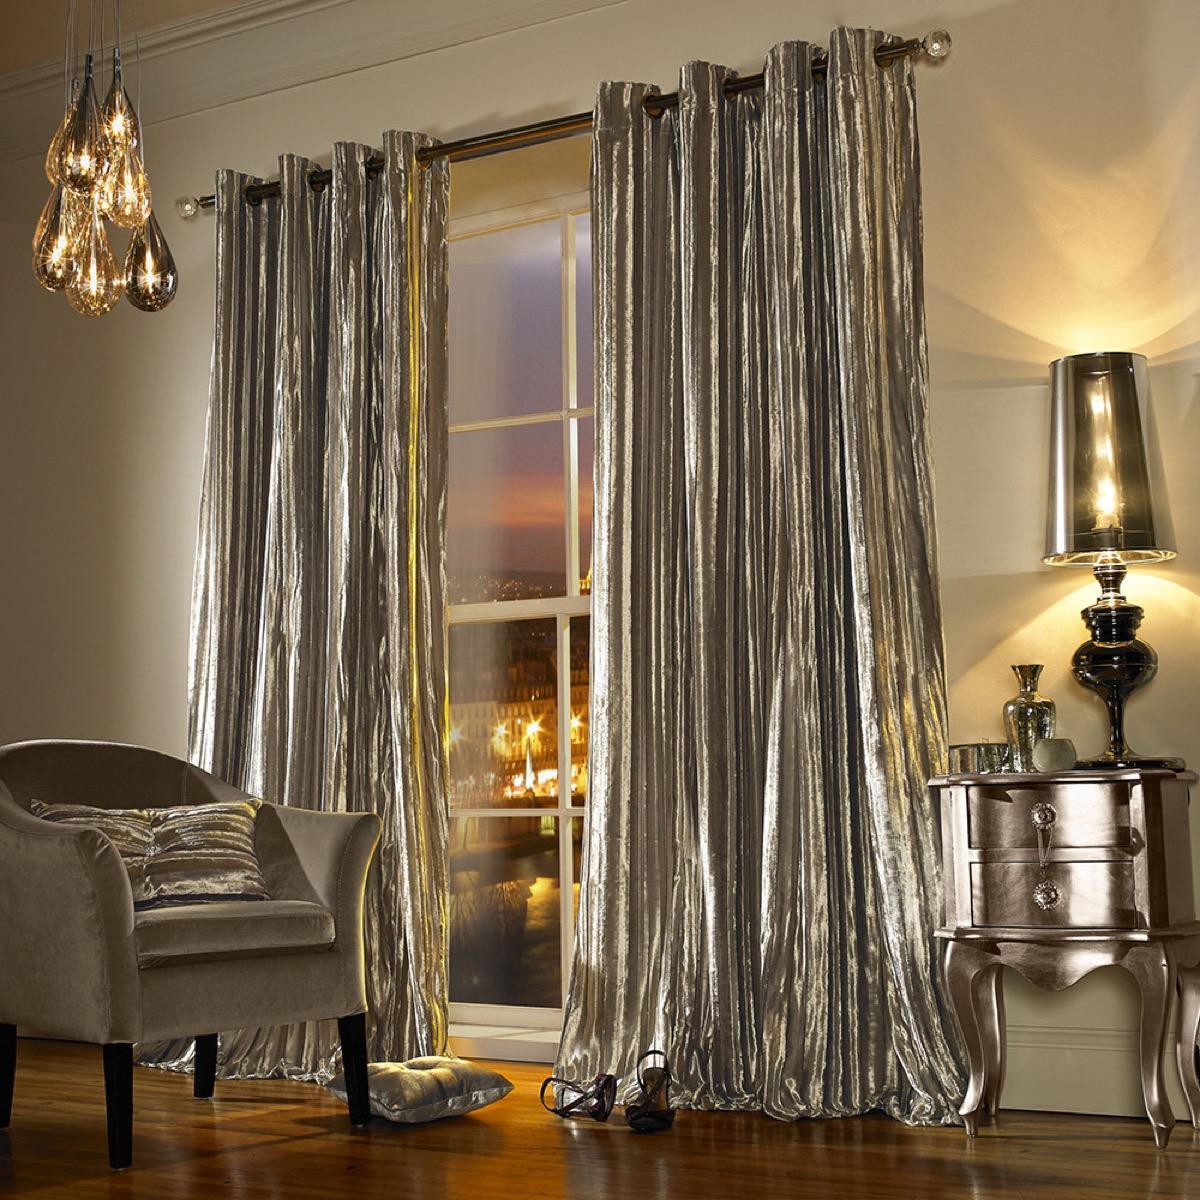 iliana eyelet curtains praline, kylie minogue, celebrity homeware